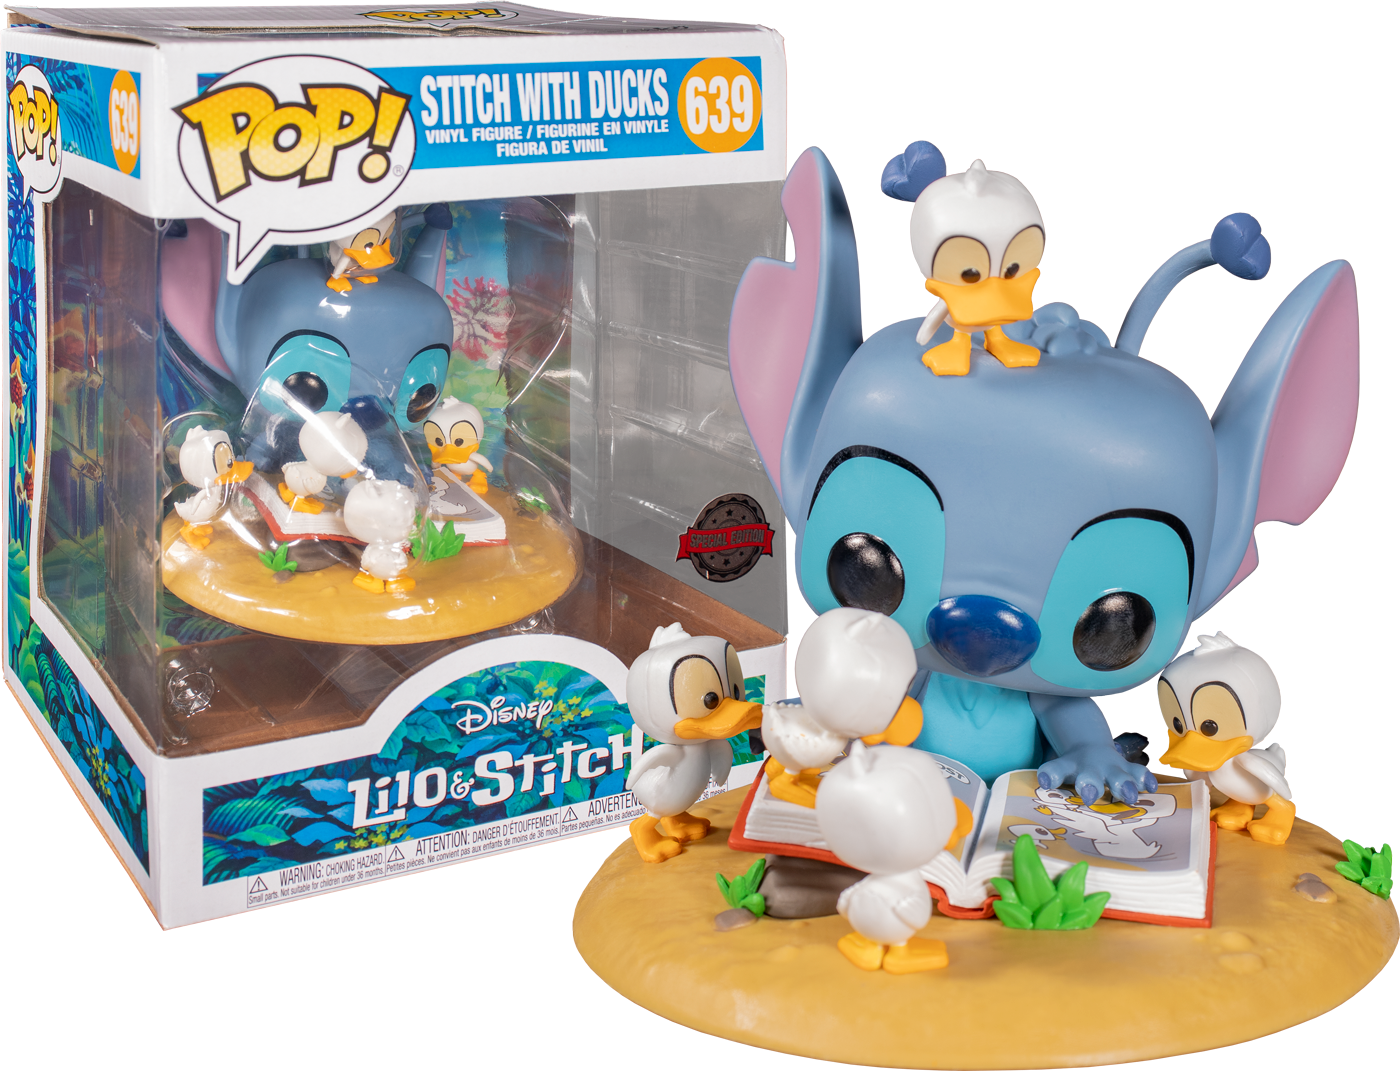 Lilo & Stitch POP! Disney Deluxe Vinyl Figure Stitch with Ducks Limited 9 cm